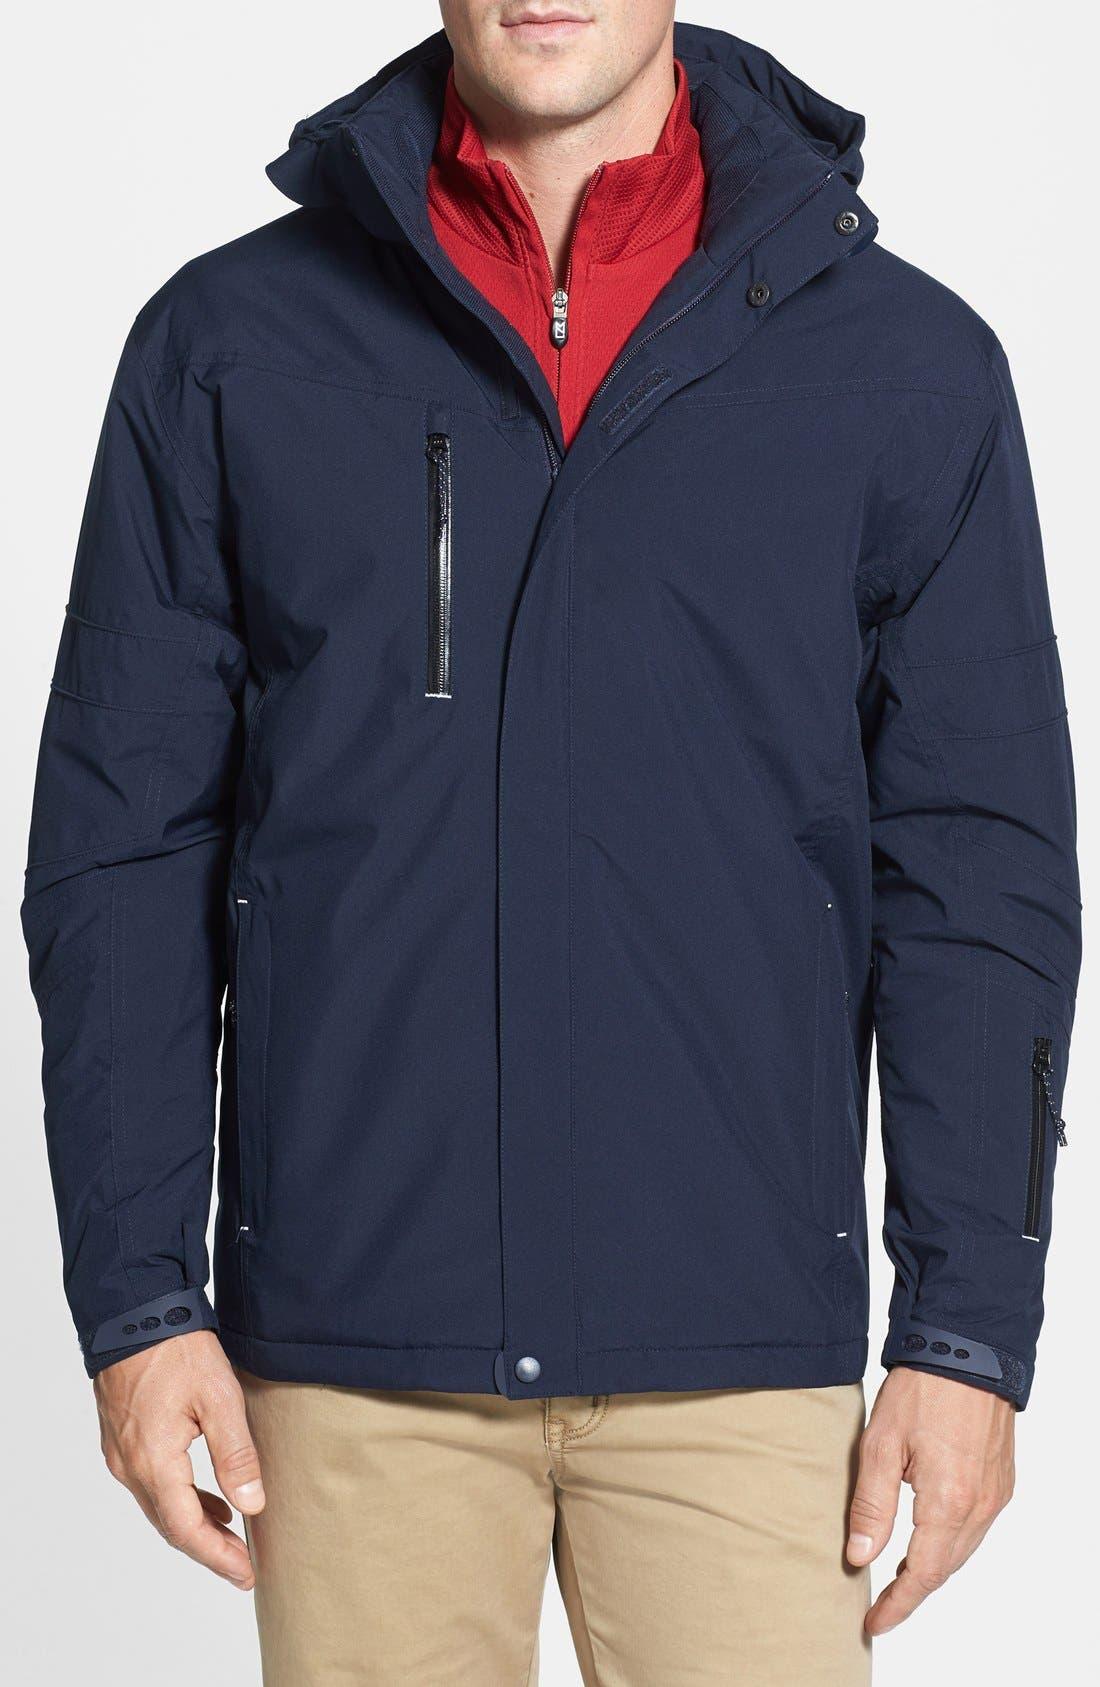 WeatherTec Sanders Jacket,                             Main thumbnail 1, color,                             420